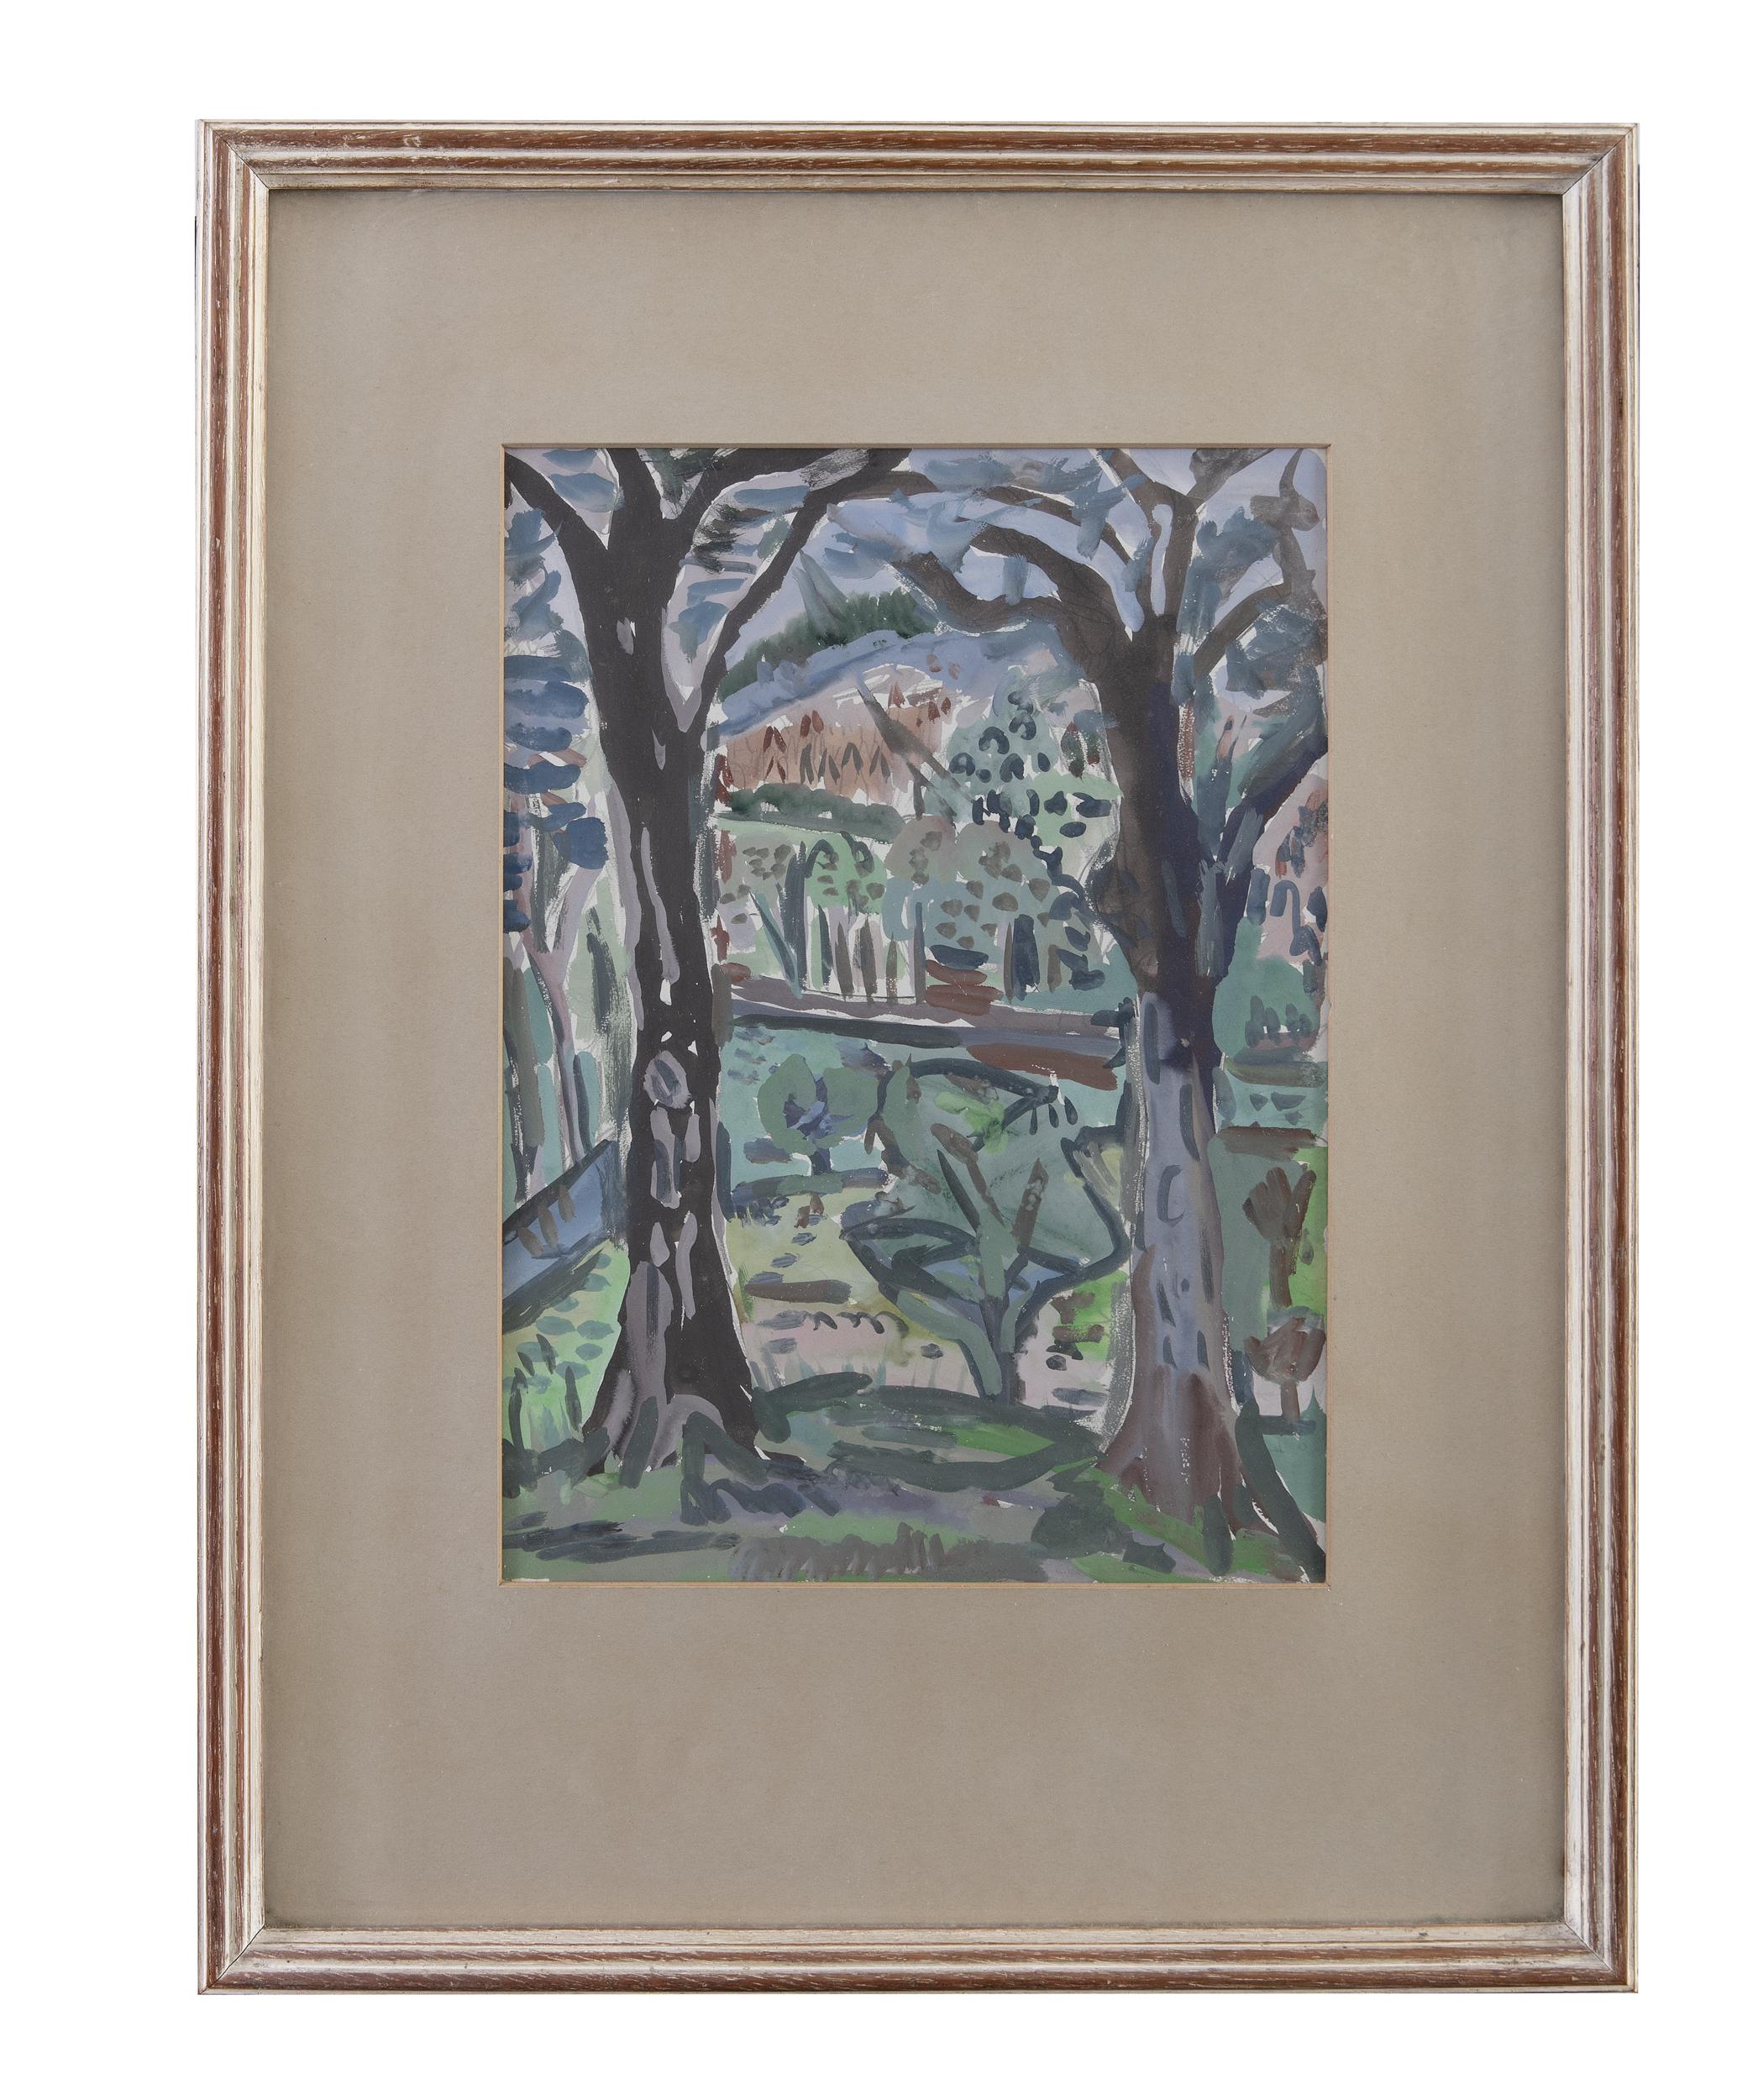 Lot 9 - Evie Hone HRHA (1894-1955)LandscapeGouache, 35 x 25cm (13¾ x 9¾)Provenance: With The Dawson Gallery,